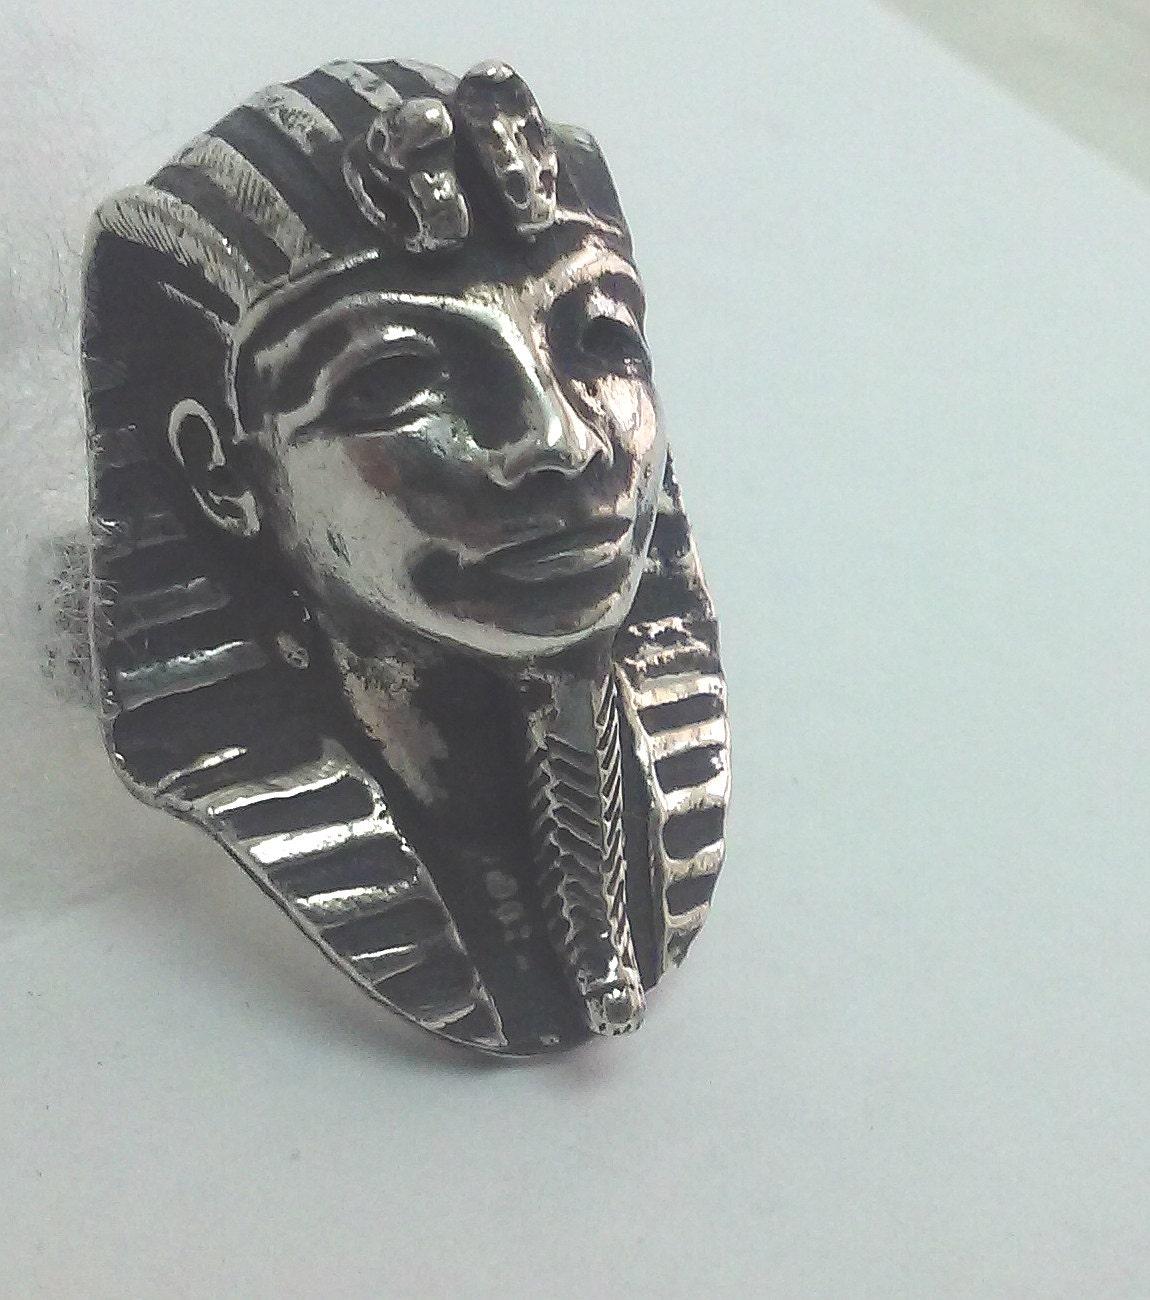 Faraón egipcia joyería anillo de Faraón rey Tut de joyas